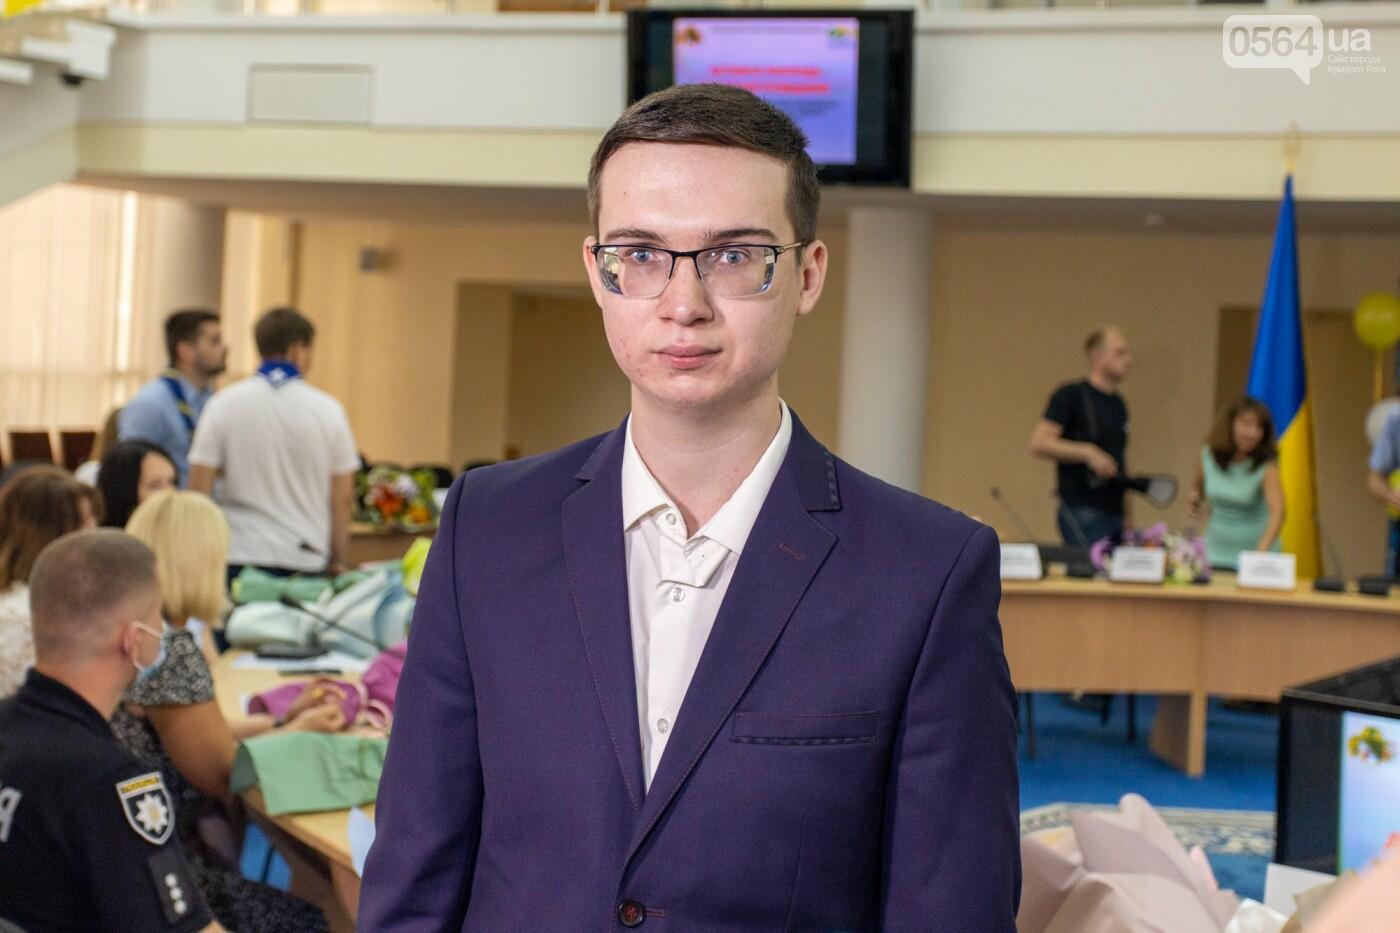 Молодым активистам Днепропетровщины вручили отличия и подарки, - ФОТО , фото-3